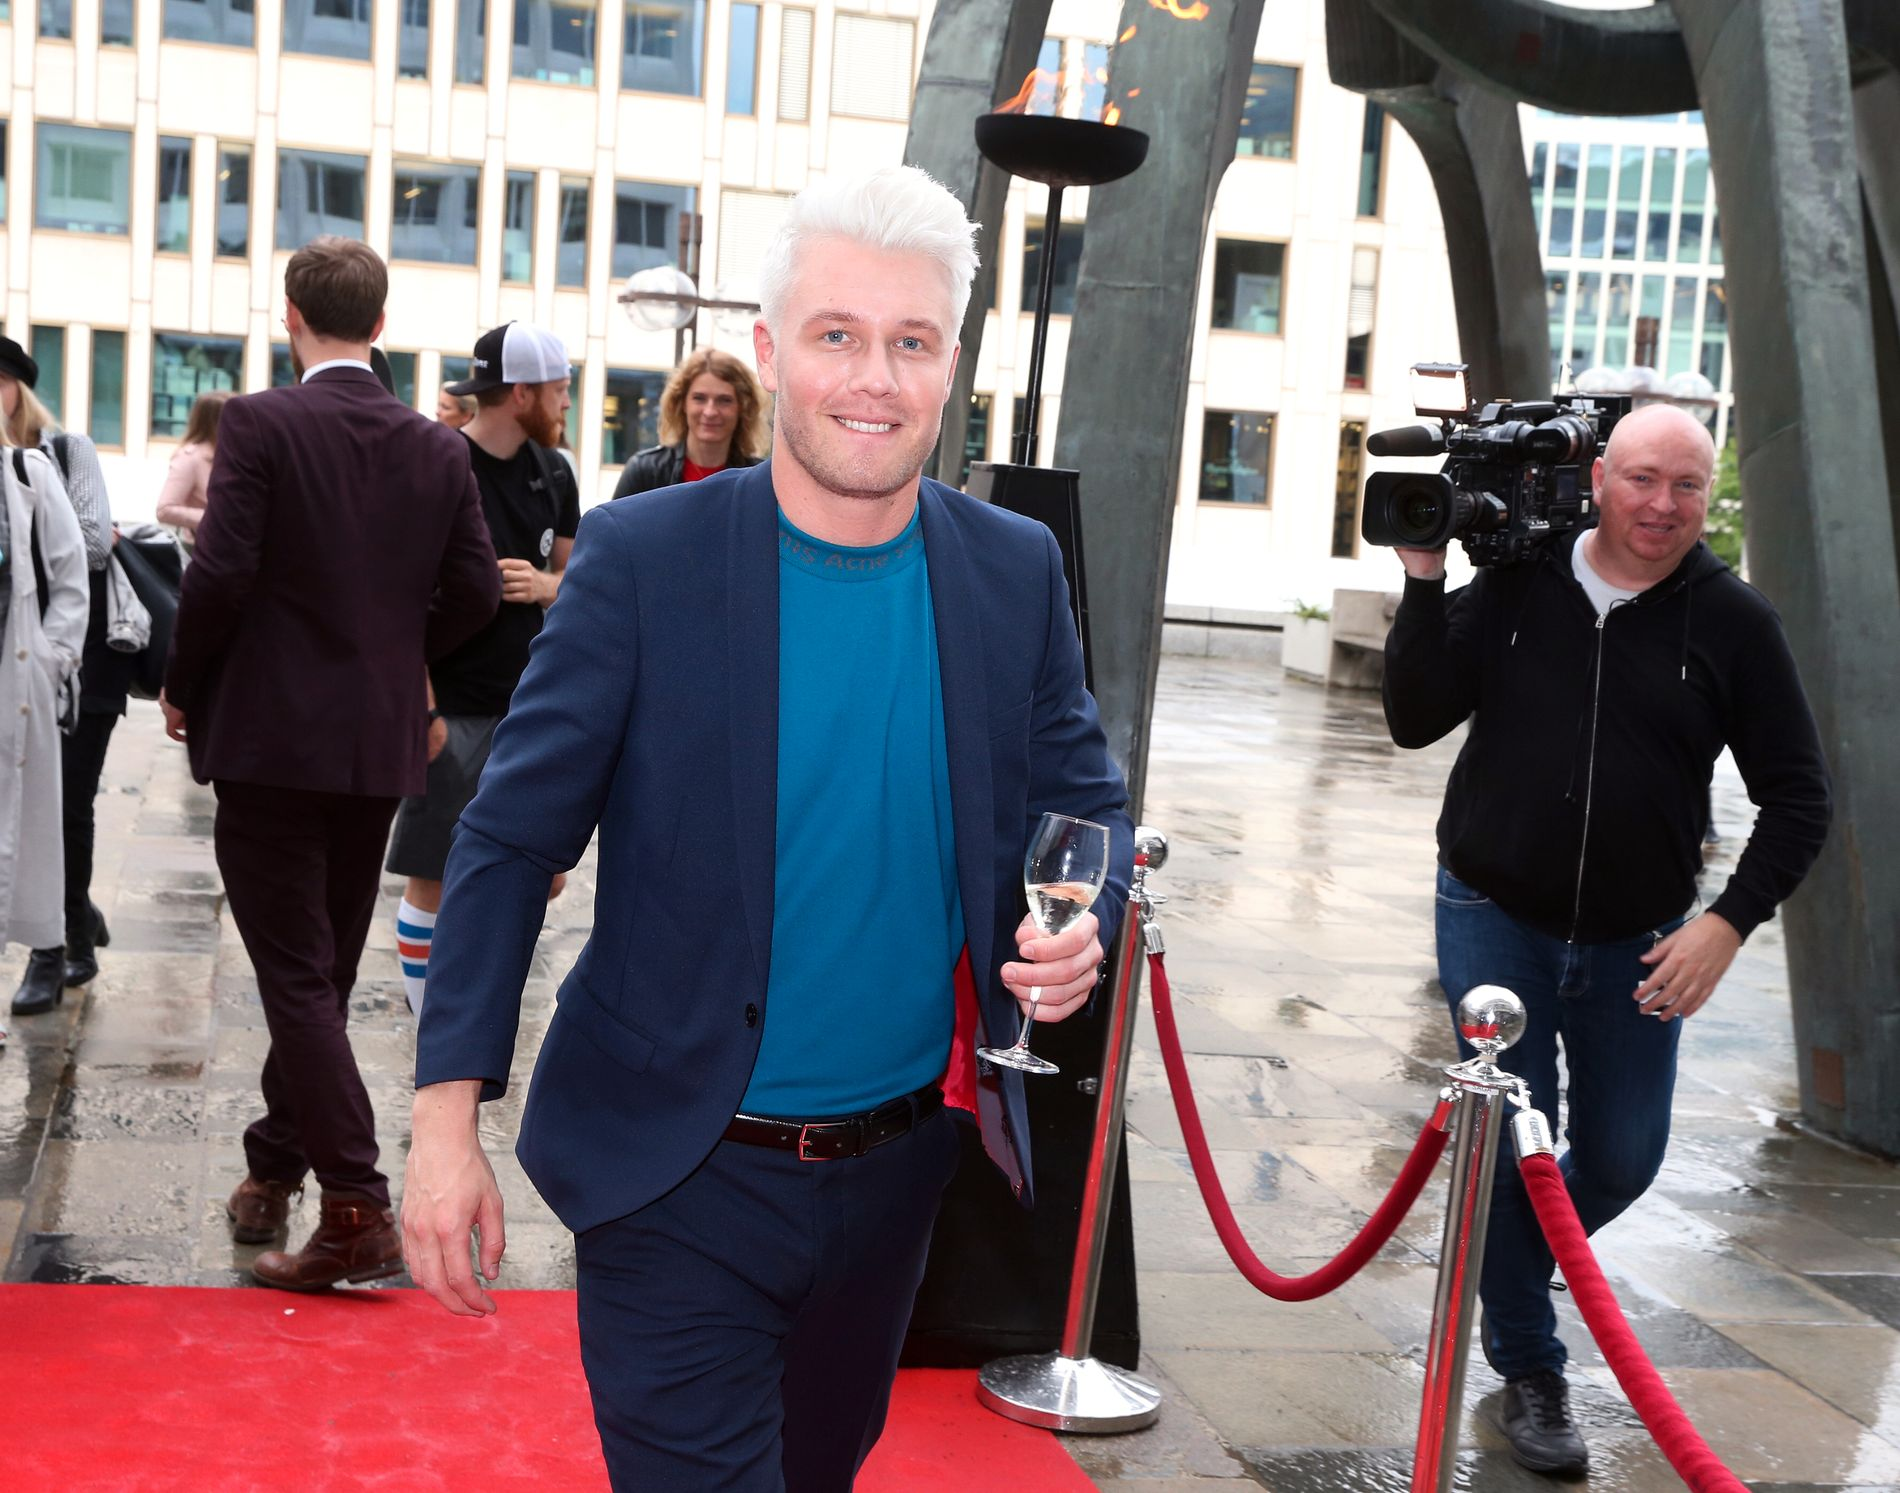 PREMIERE: Herman Flesvig på rød løper til festpremiere i Oslo tirsdag kveld.